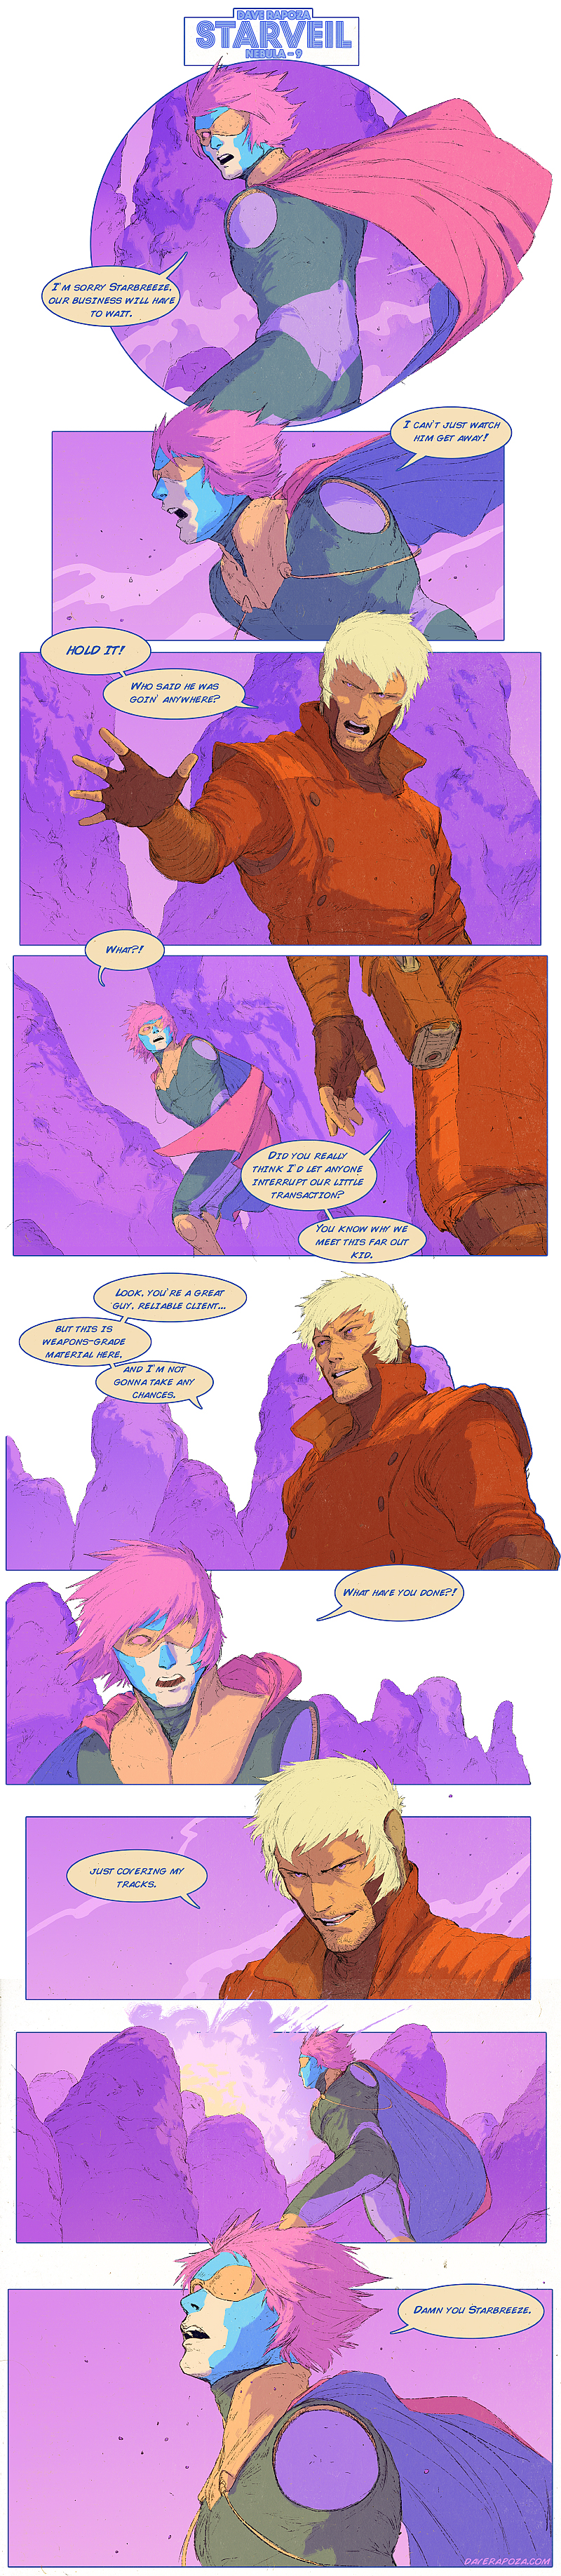 StarVeil - Nebula #9 (motion comic in description) by DavidRapozaArt